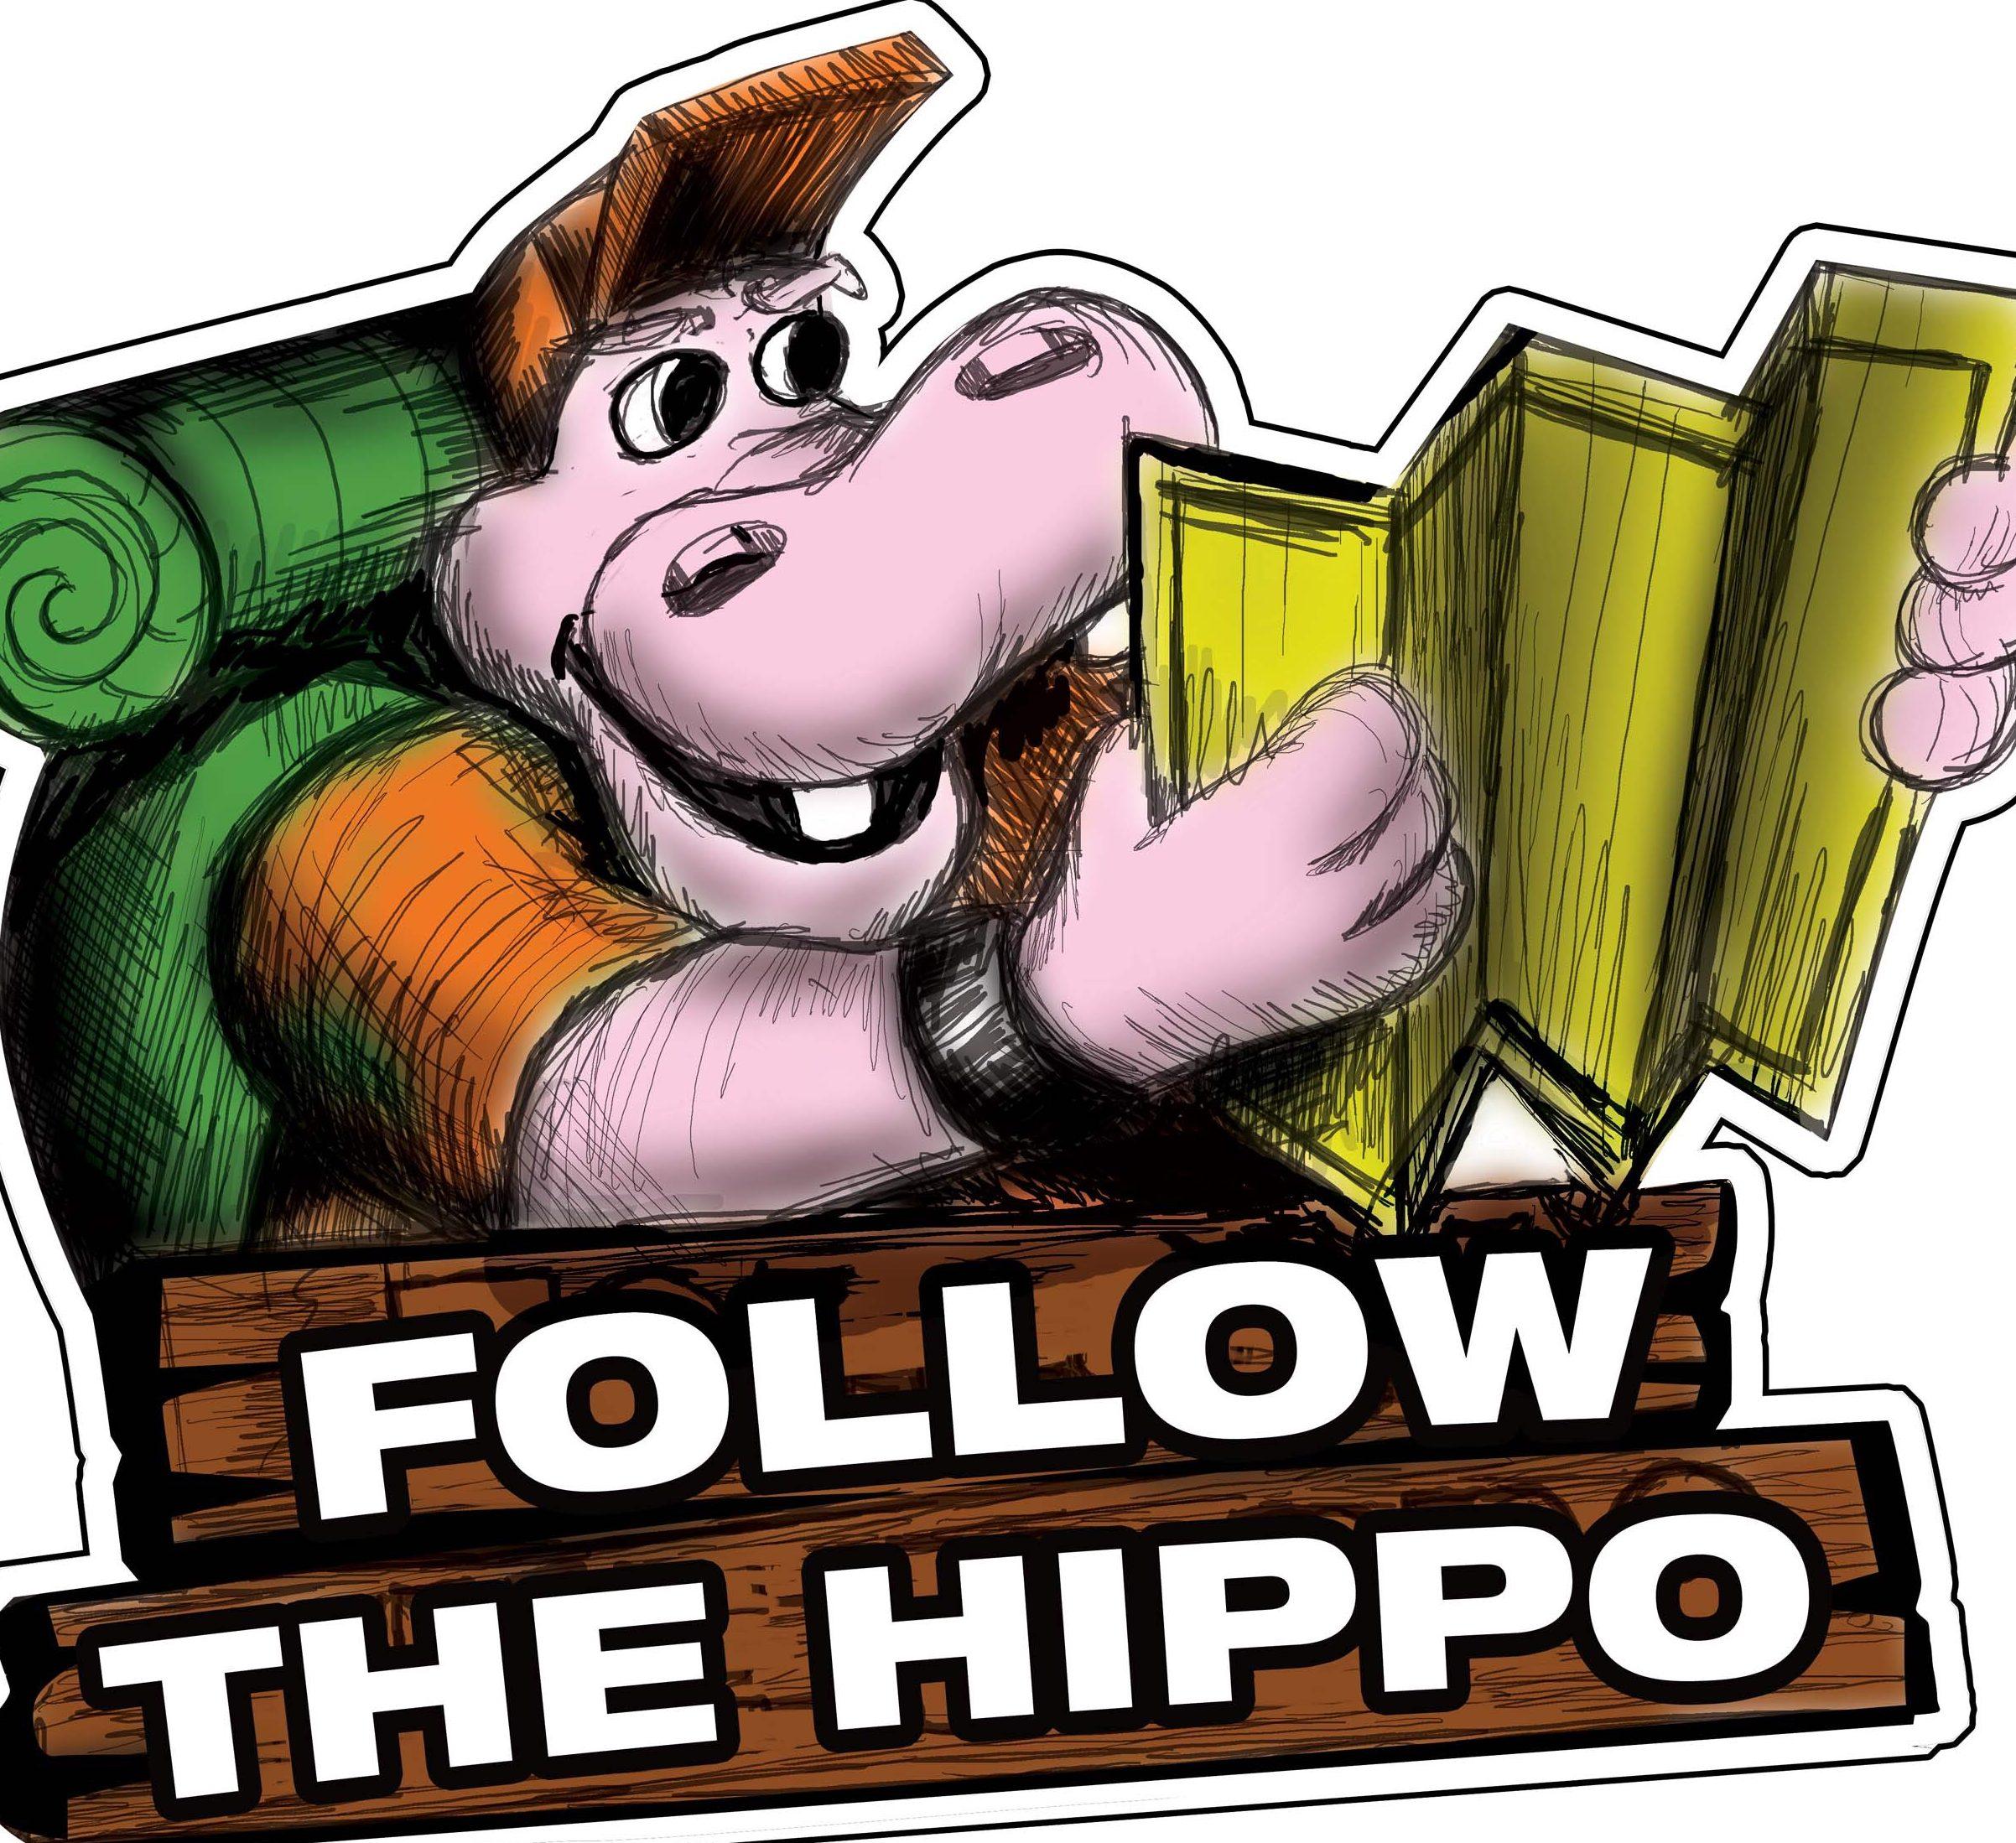 followthehippo